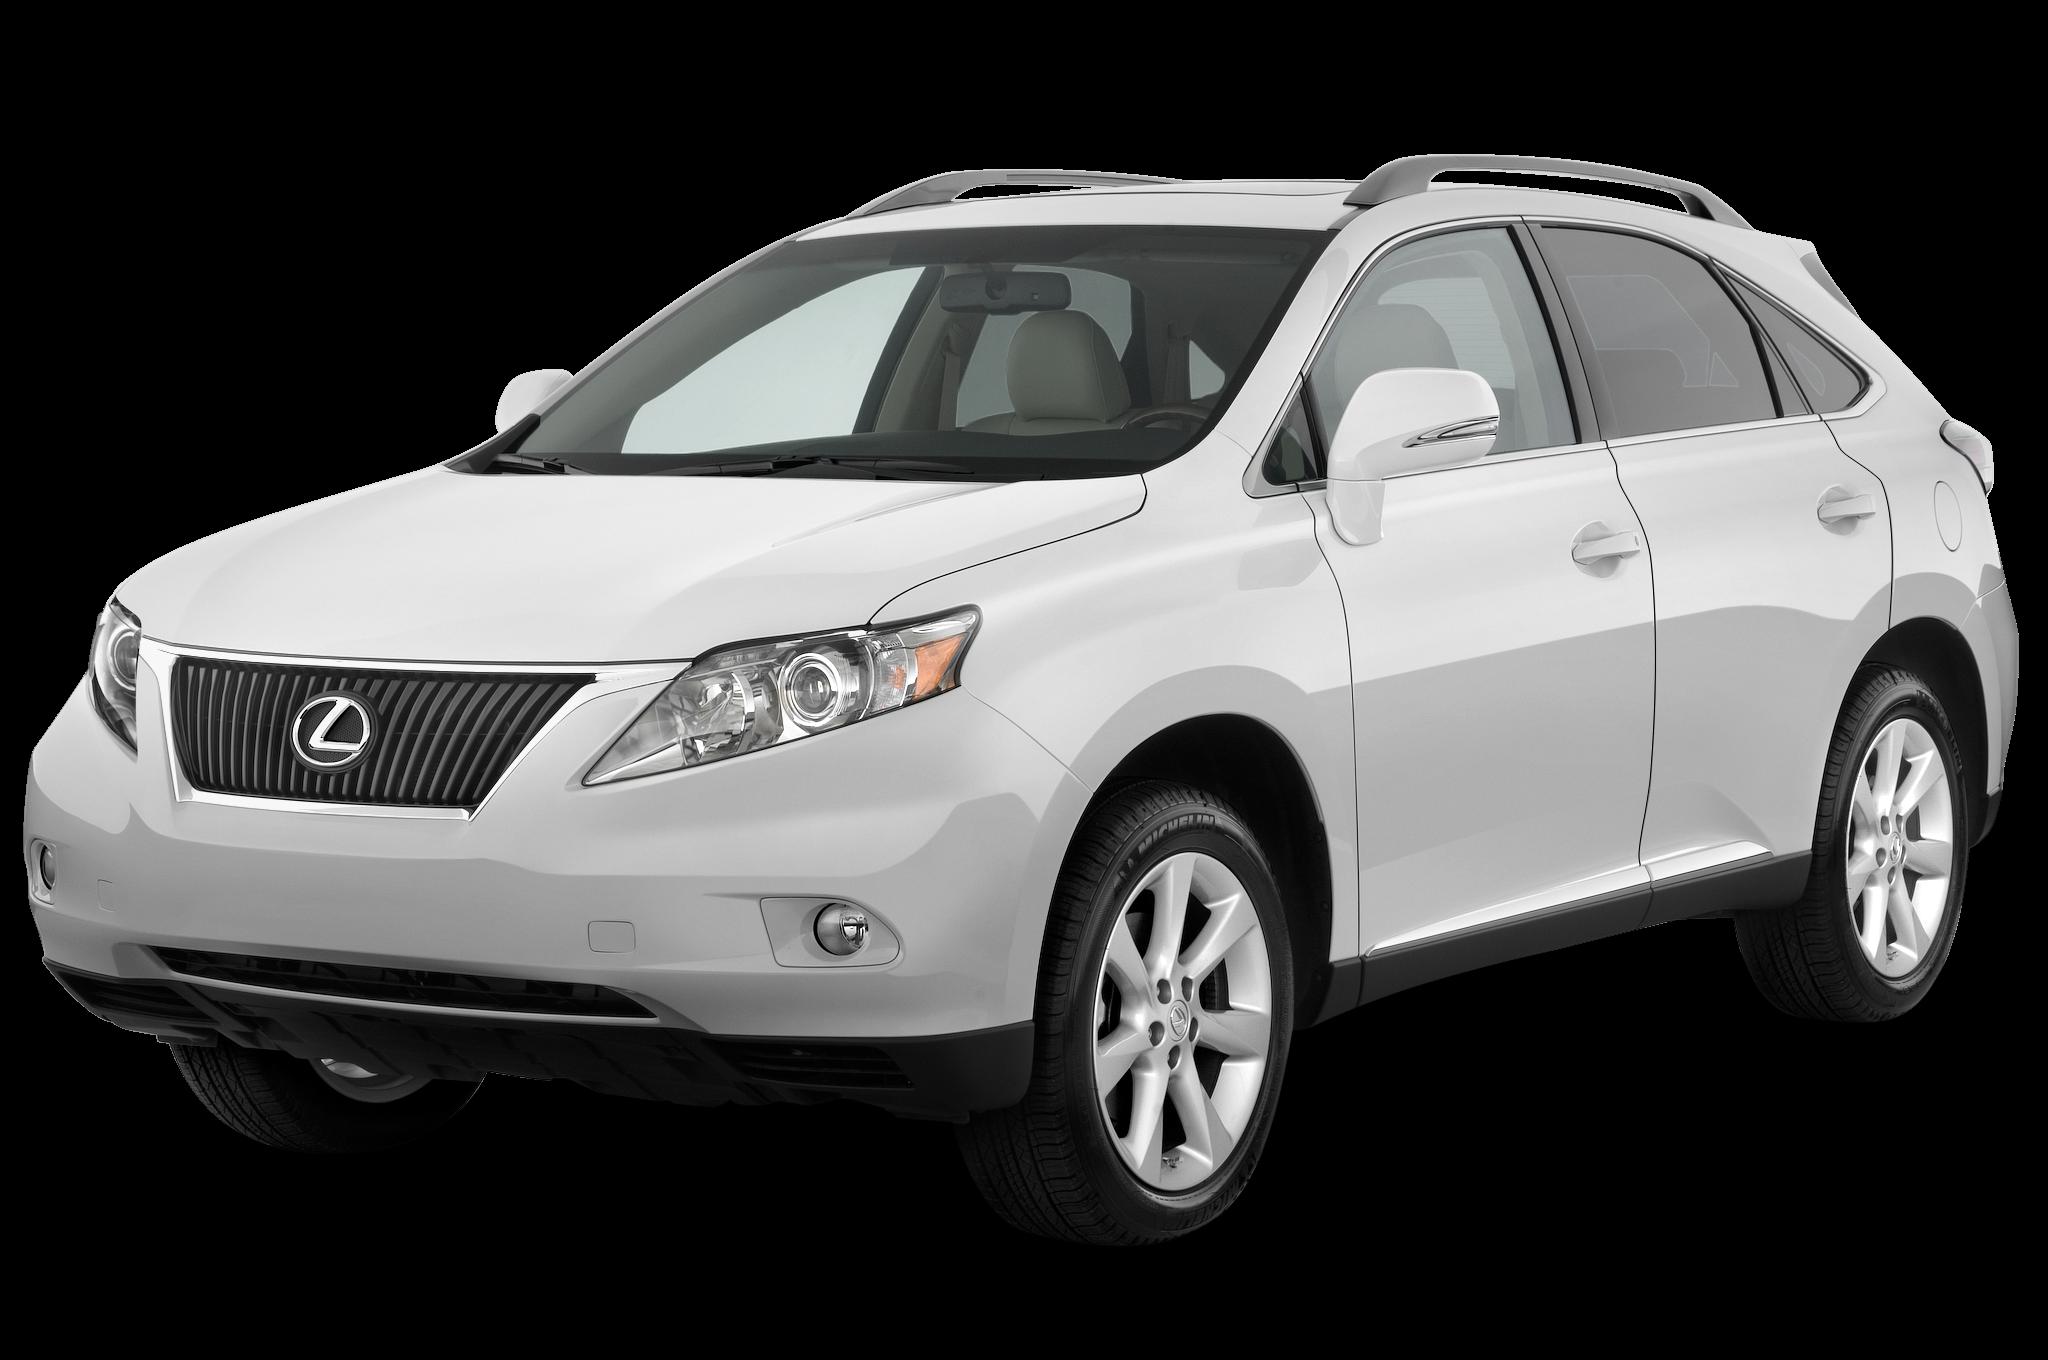 glamorous autoevolution interior specs lexus rx of